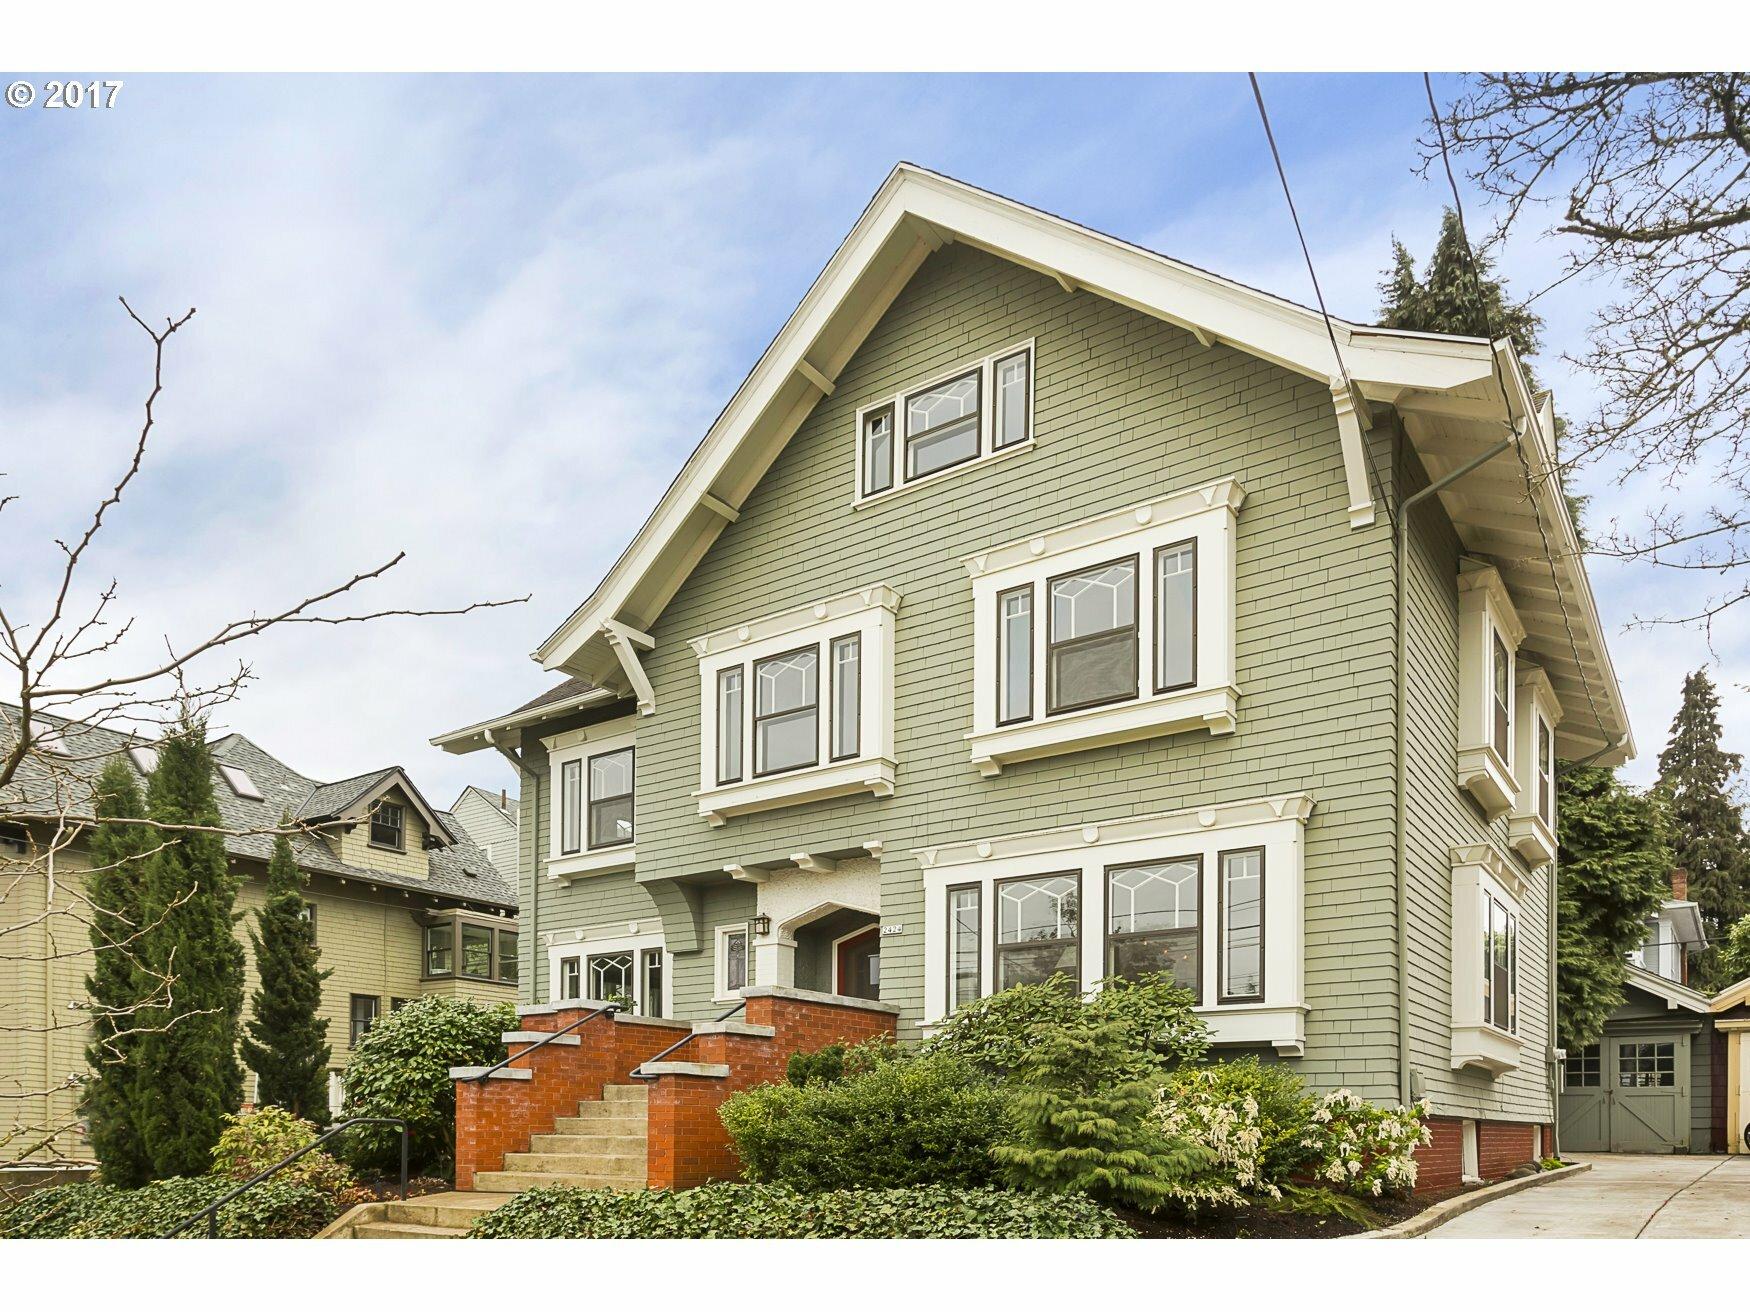 2424 Nw Northrup St, Portland, OR - USA (photo 2)